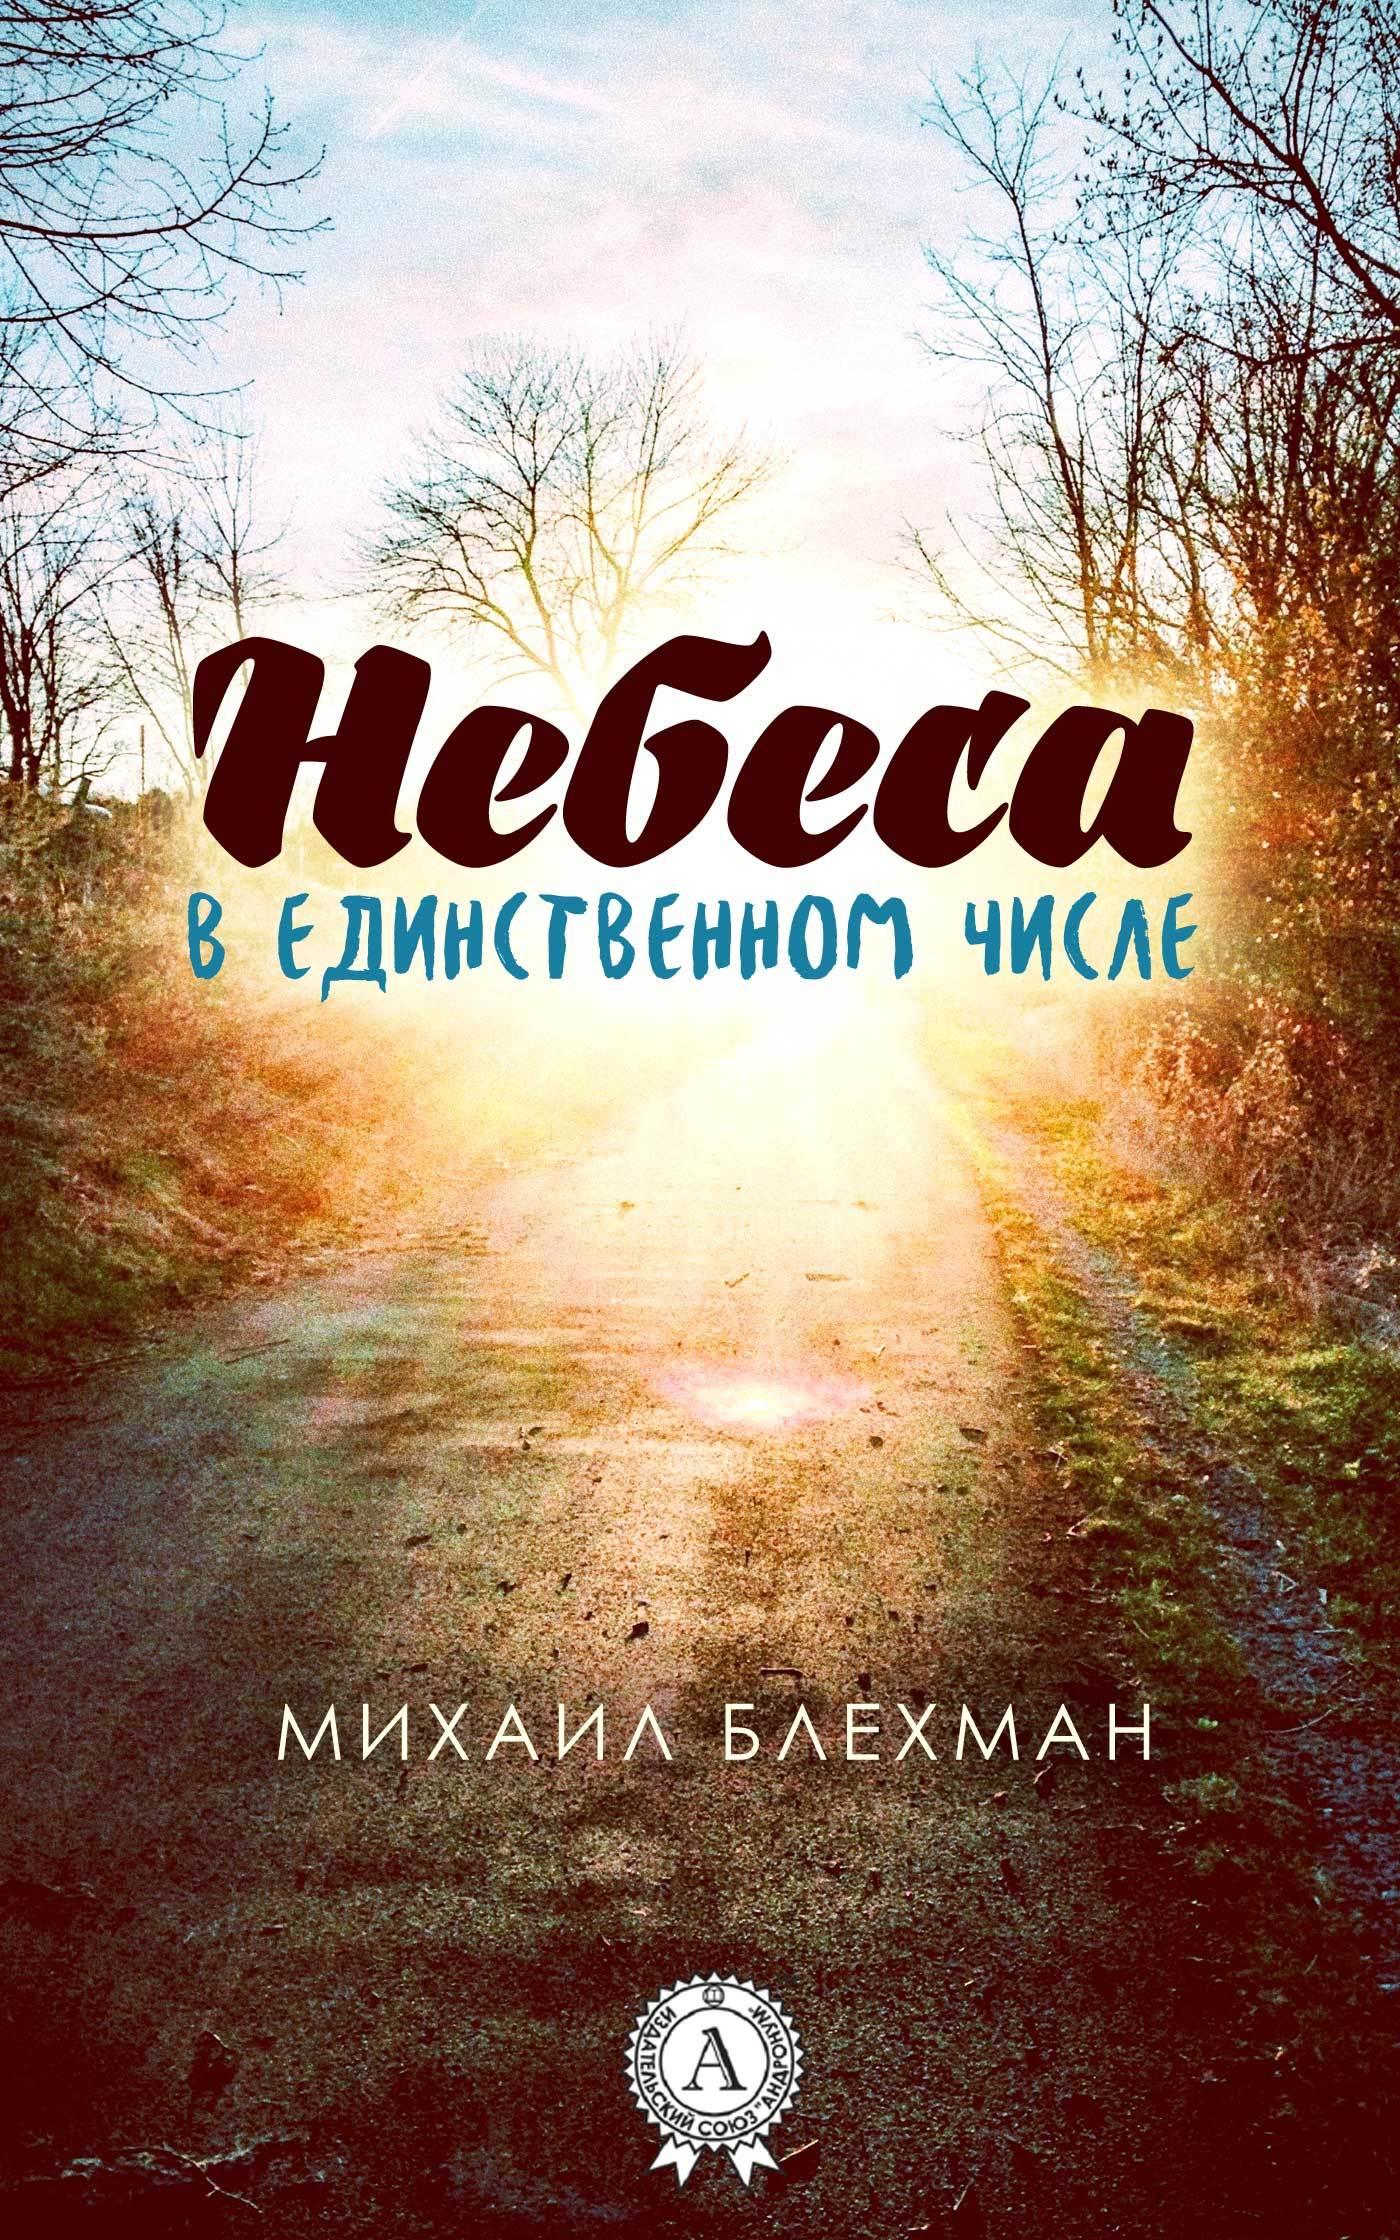 Михаил Блехман бесплатно